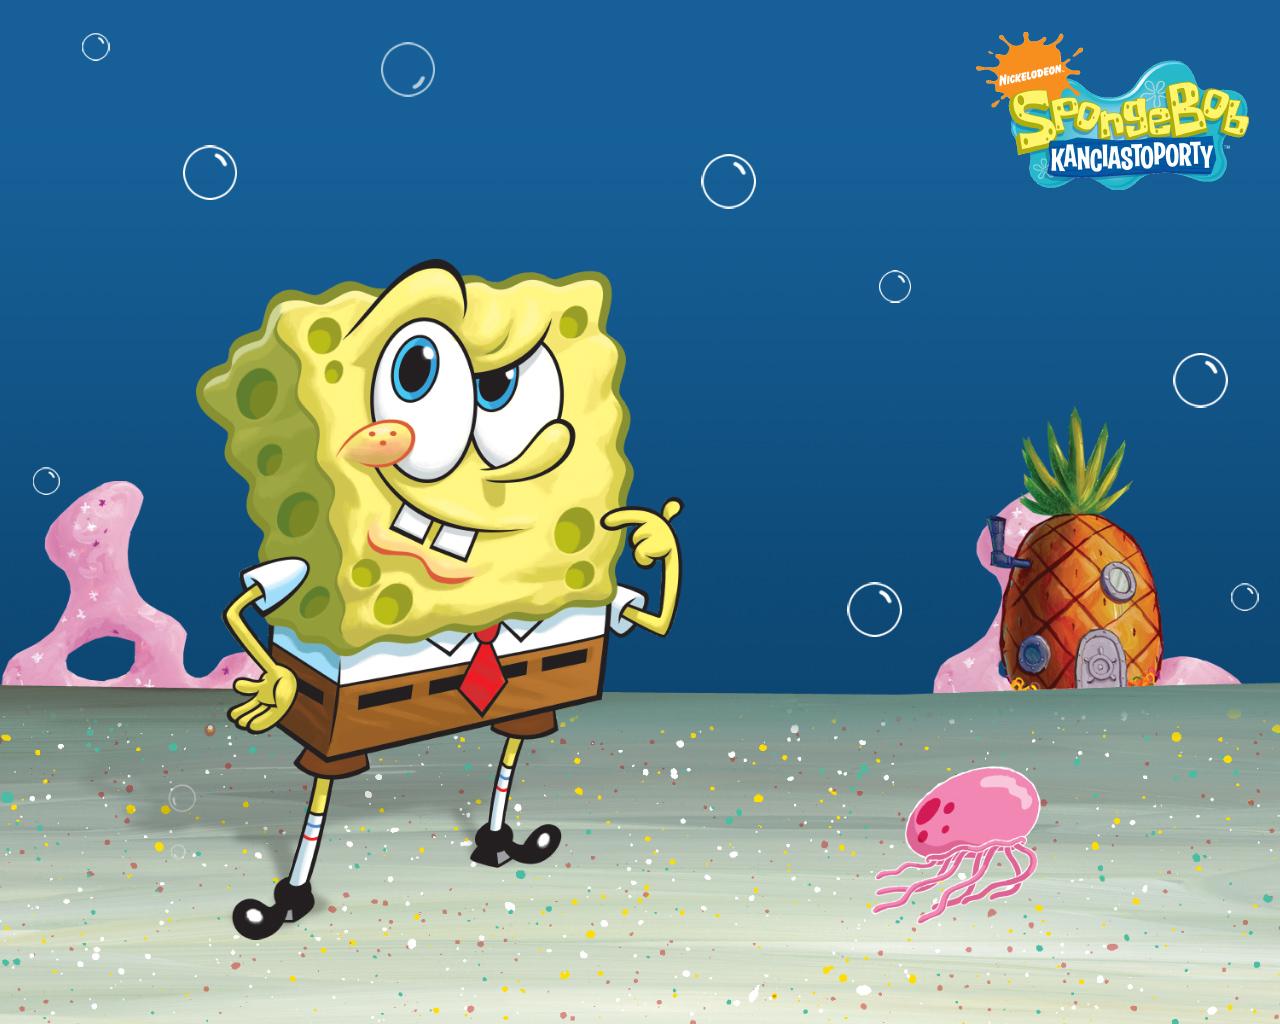 Spongebob Nick Wallpaper All HD Wallpapers 1280x1024